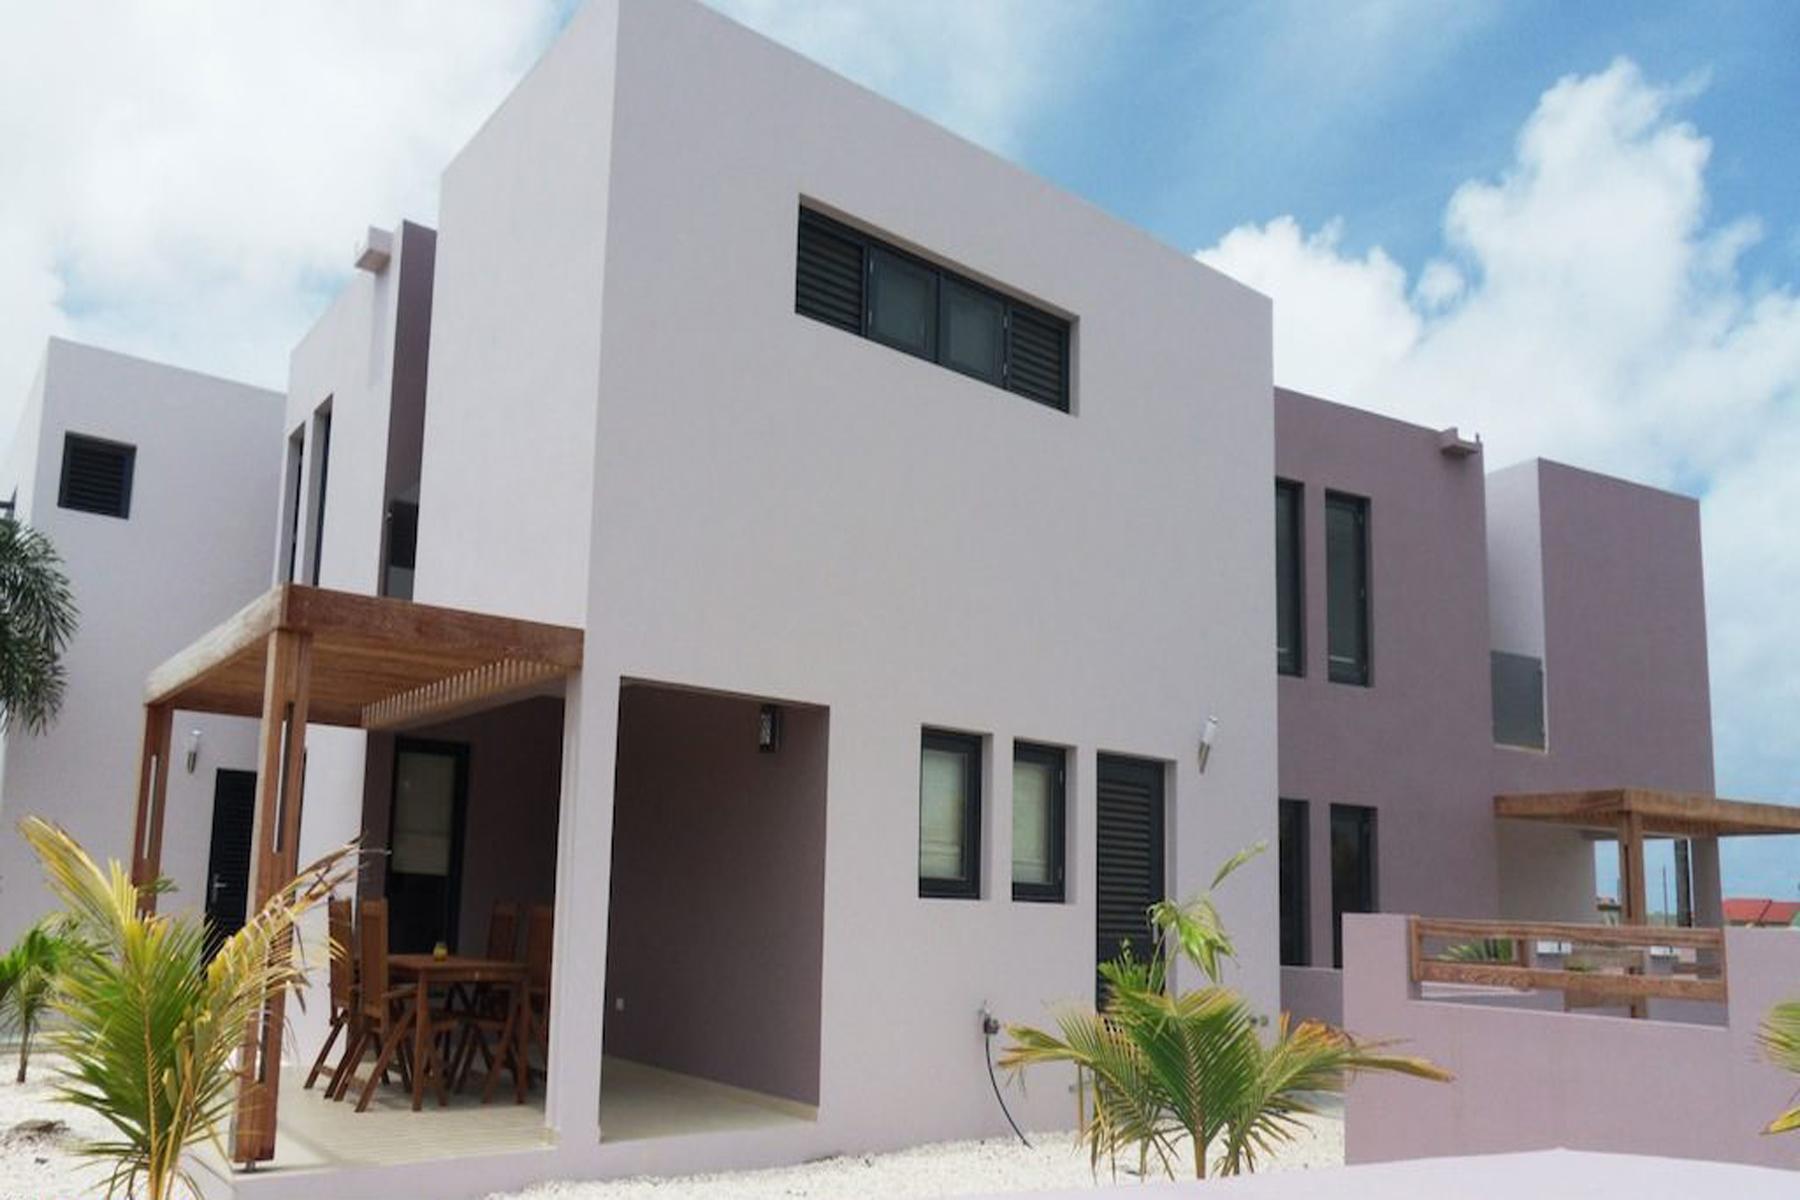 Single Family Home for Sale at Villa Saturnus Belnem, Bonaire